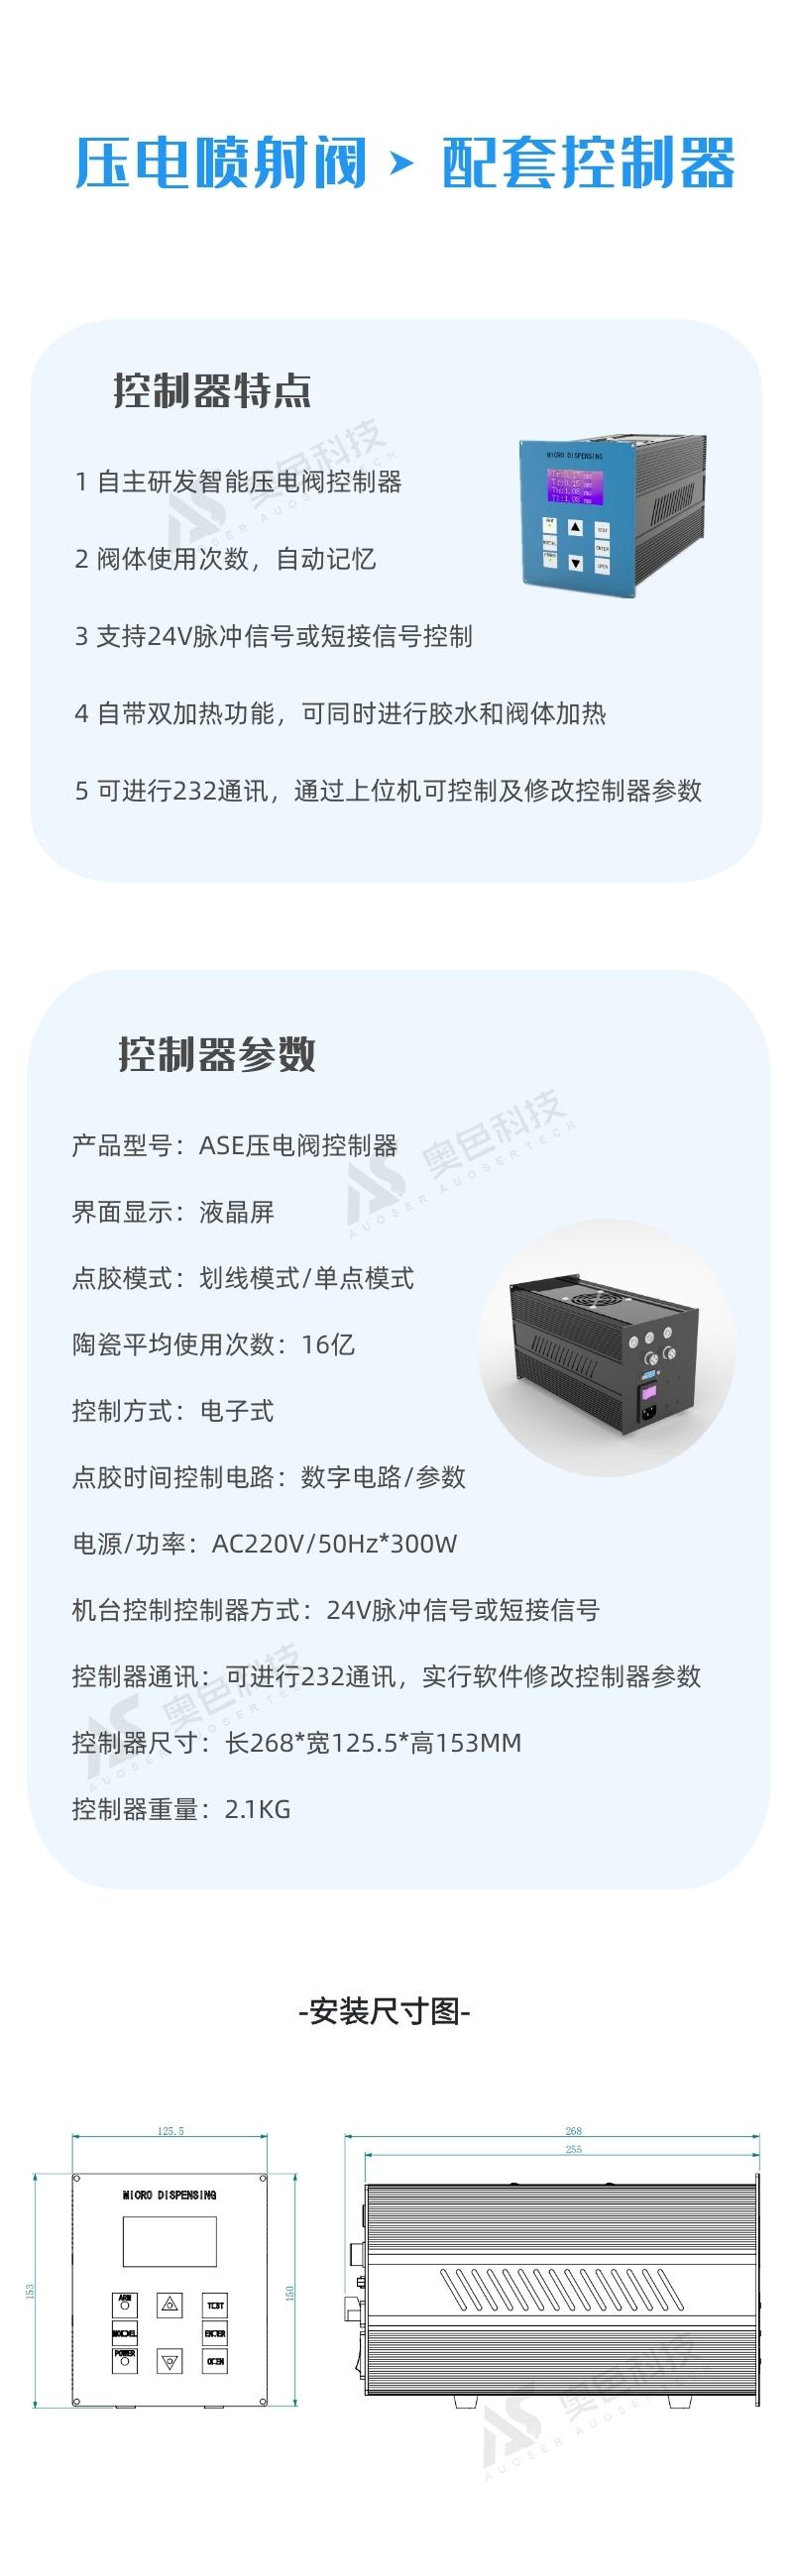 3 ASE750H-30CC-H 压电阀-详情页.jpg